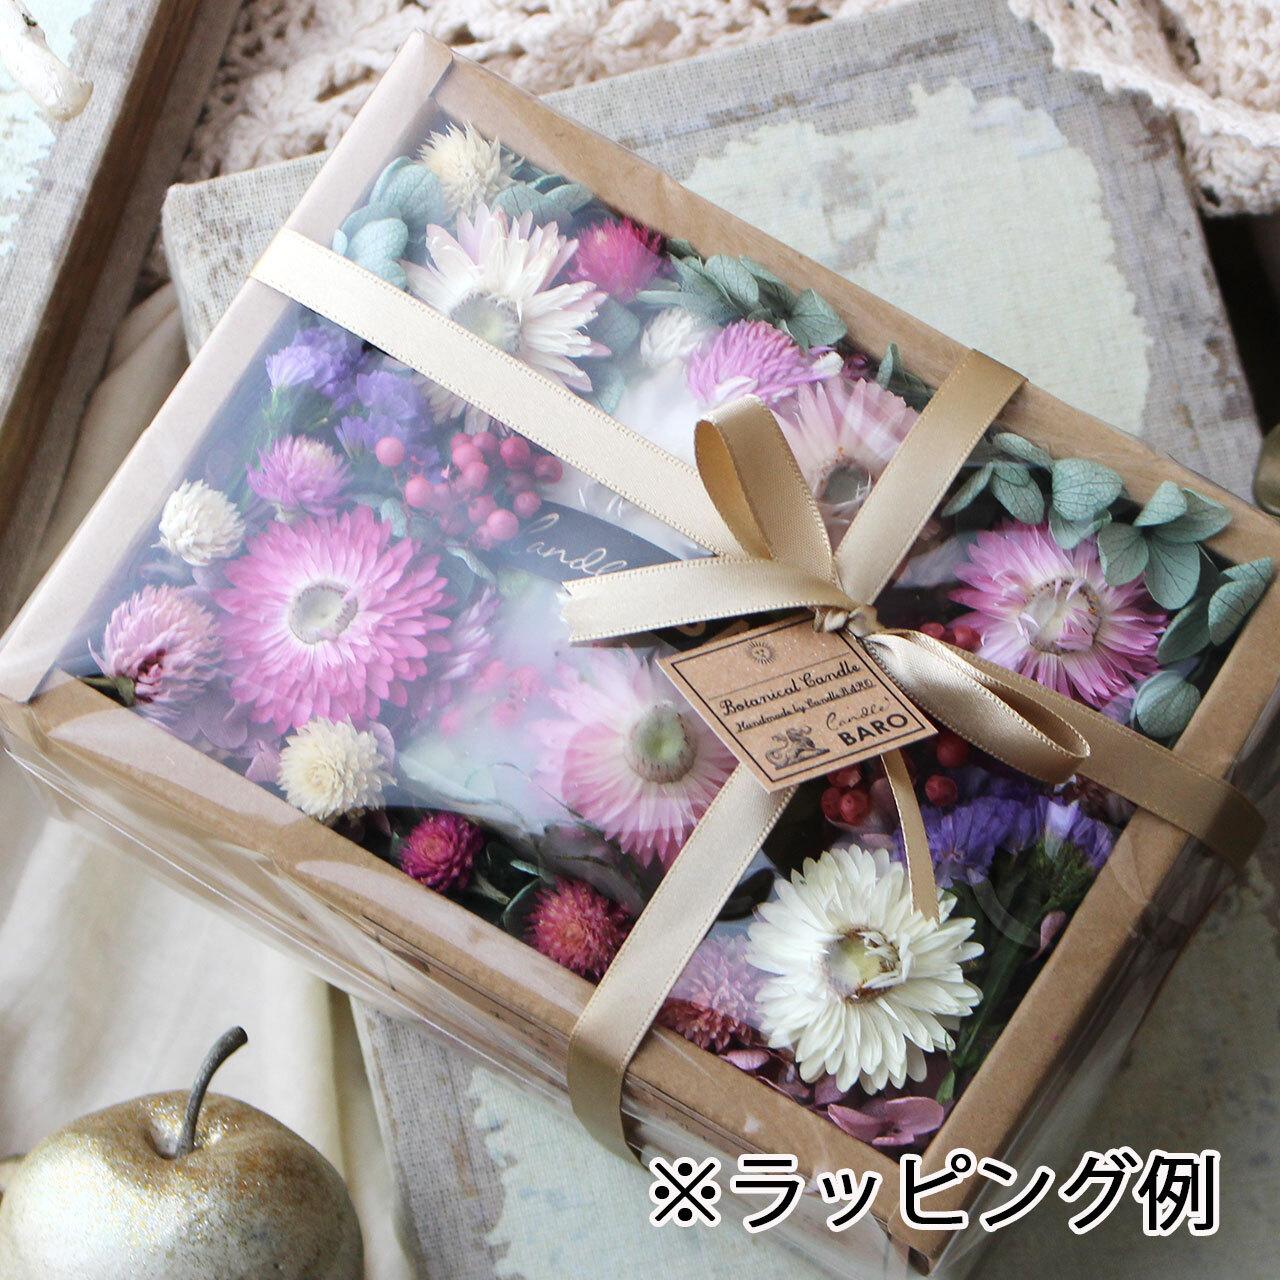 H482 透明ラッピング&紙袋付き☆ボタニカルキャンドルギフト ラナンキュラス